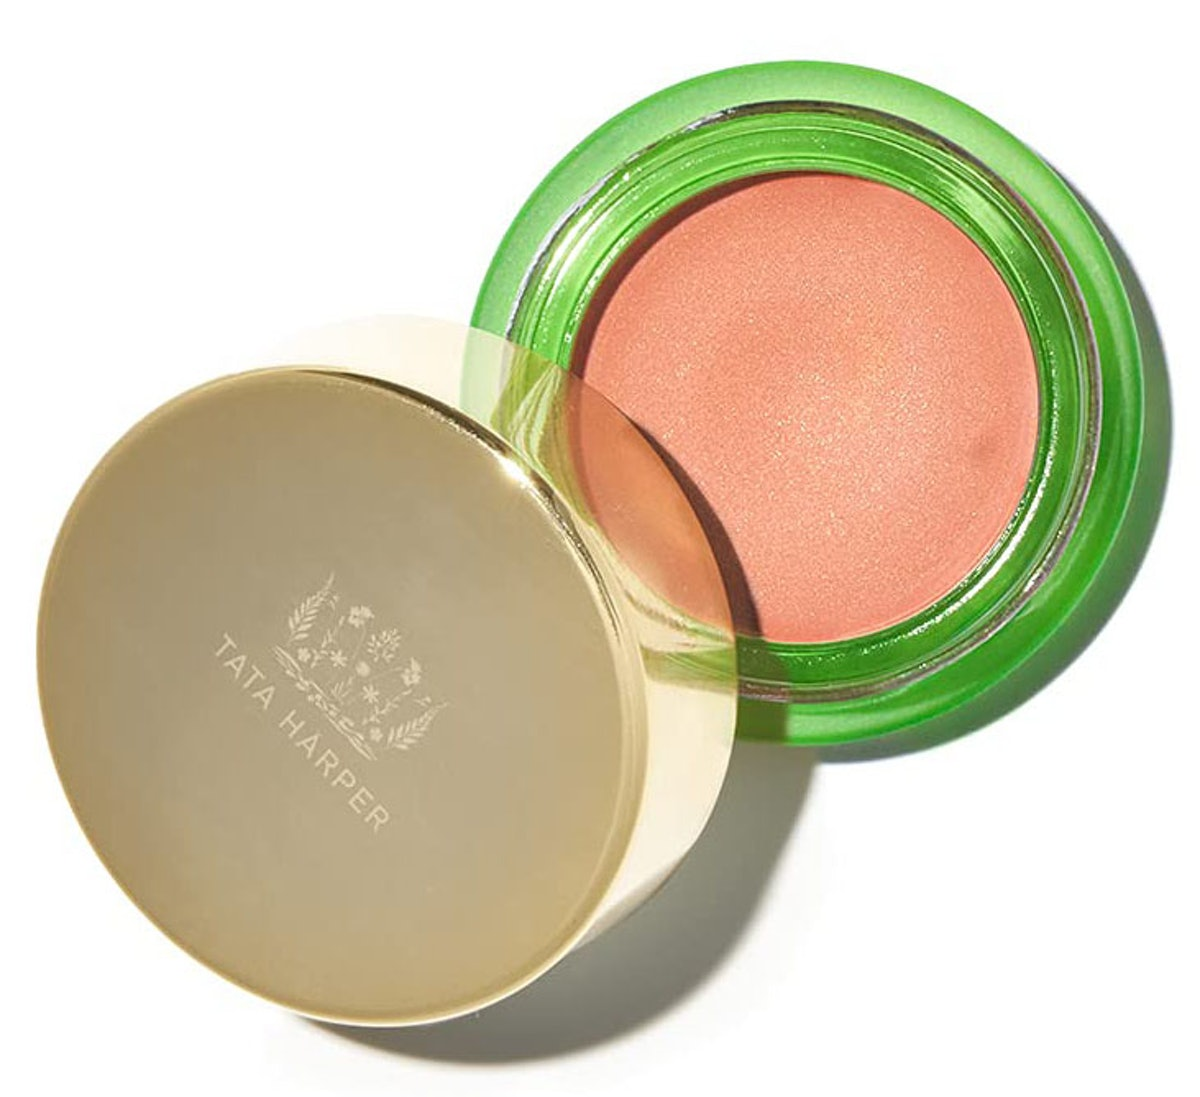 Tata Harper Golden Peach Cream Blush